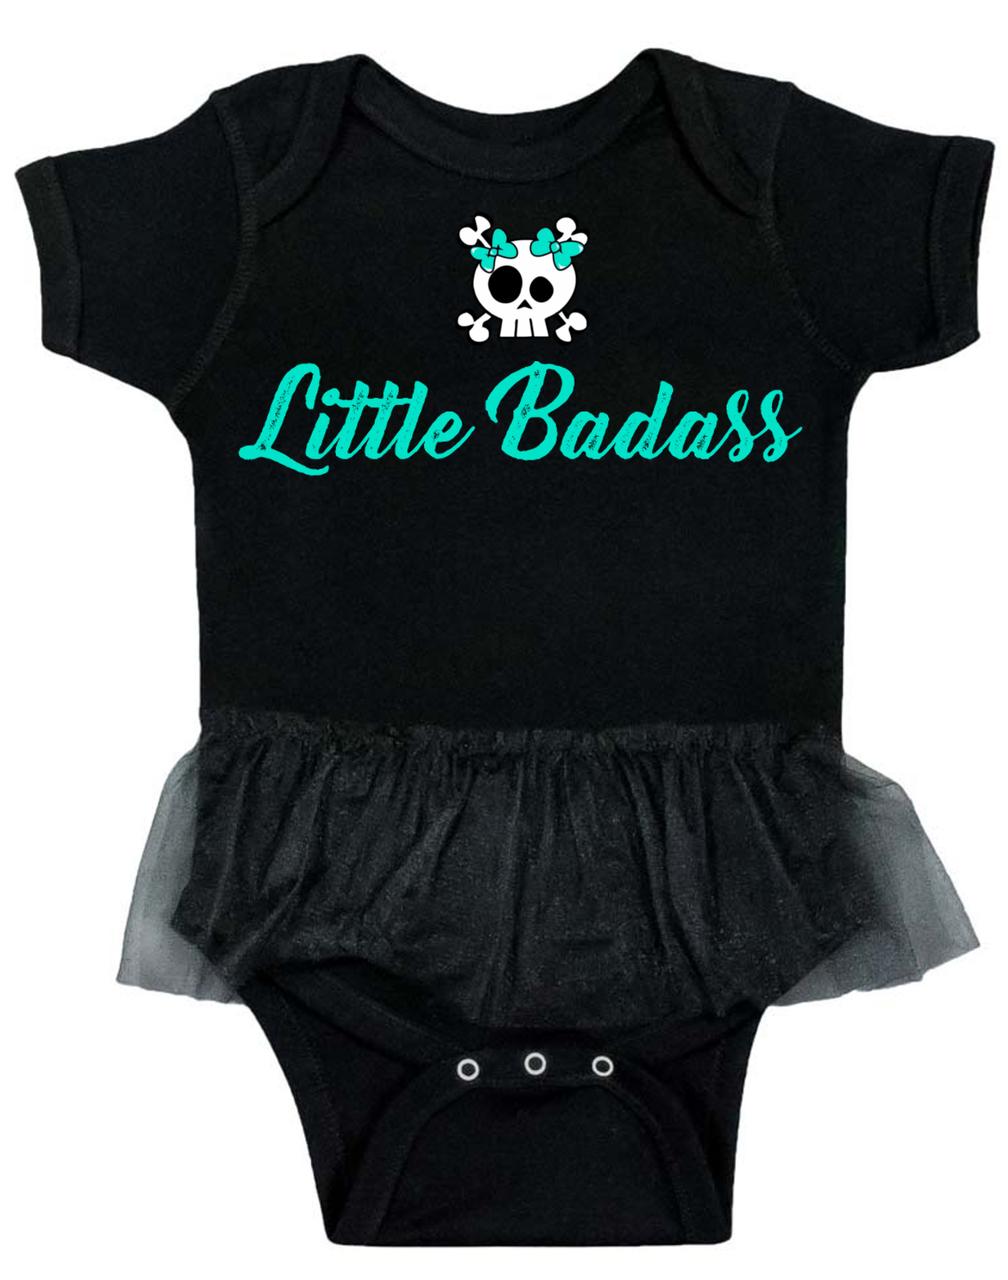 72e192a4bfa7 Little Badass Tutu baby Bodysuit, Cool baby Bodysuit with tutu, Little  Badass baby girl